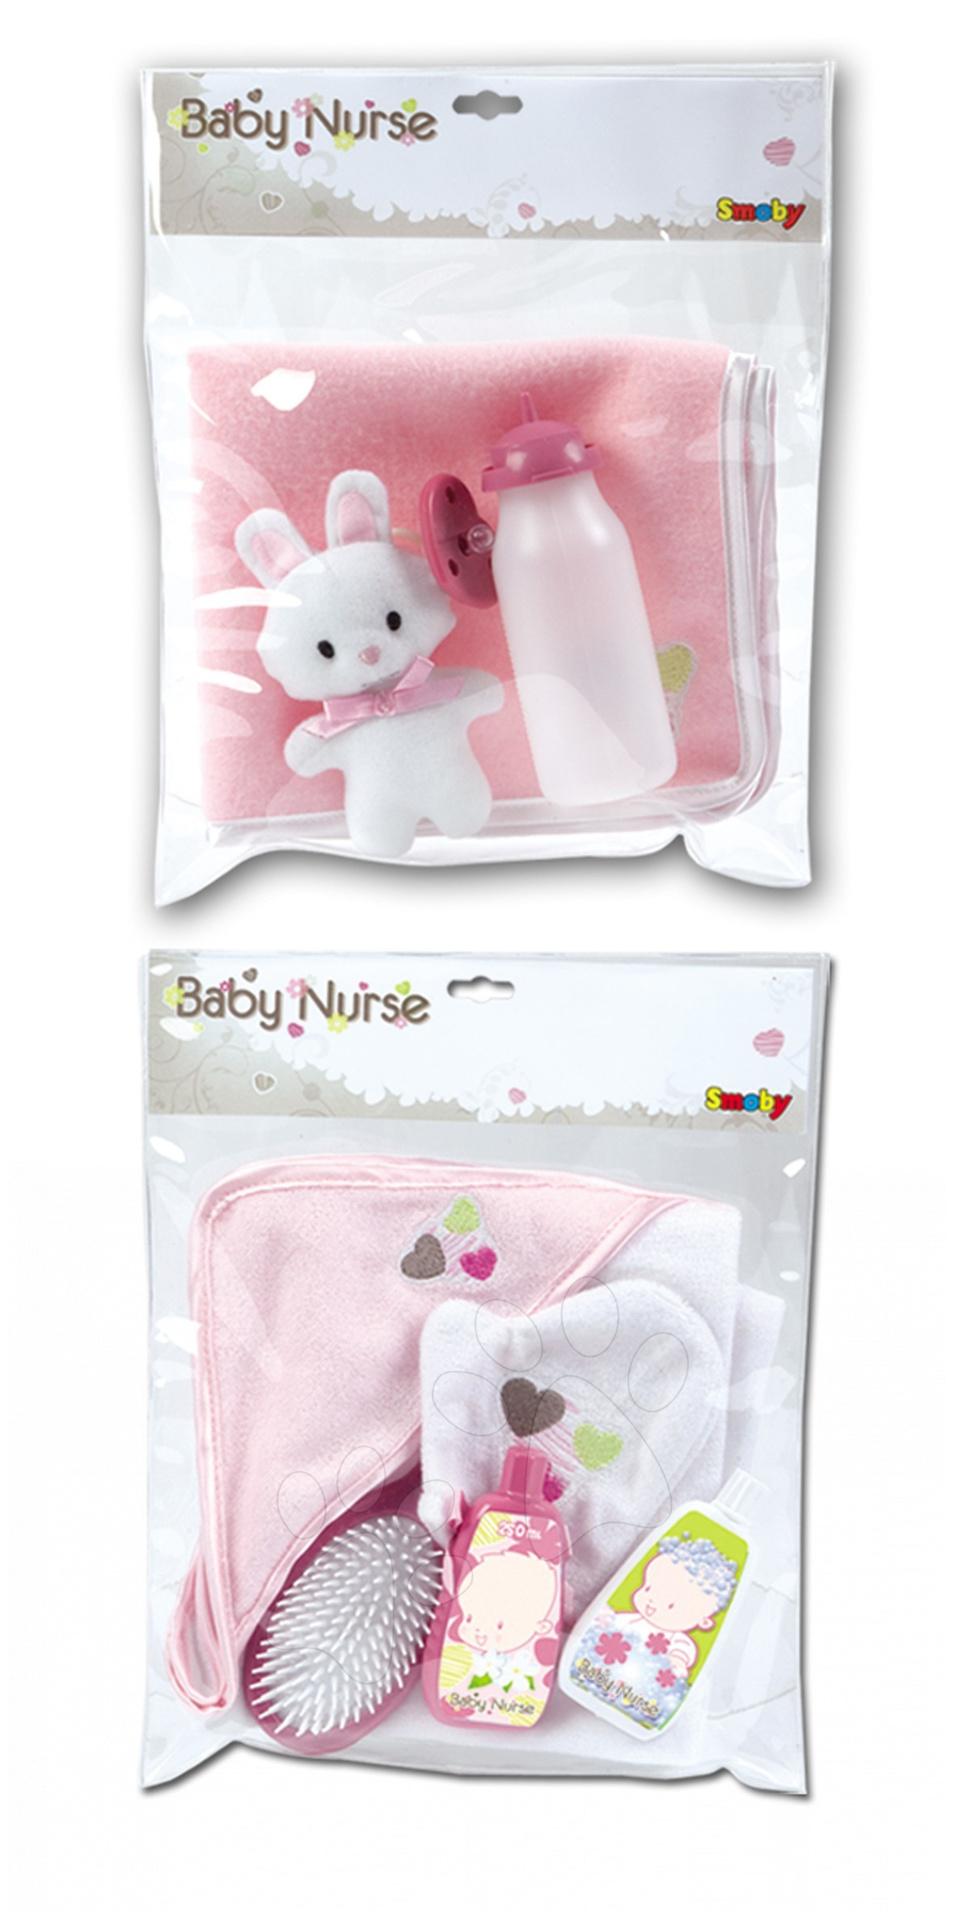 Staré položky - Baby Nurse sada do koupelny Smoby pro panenku